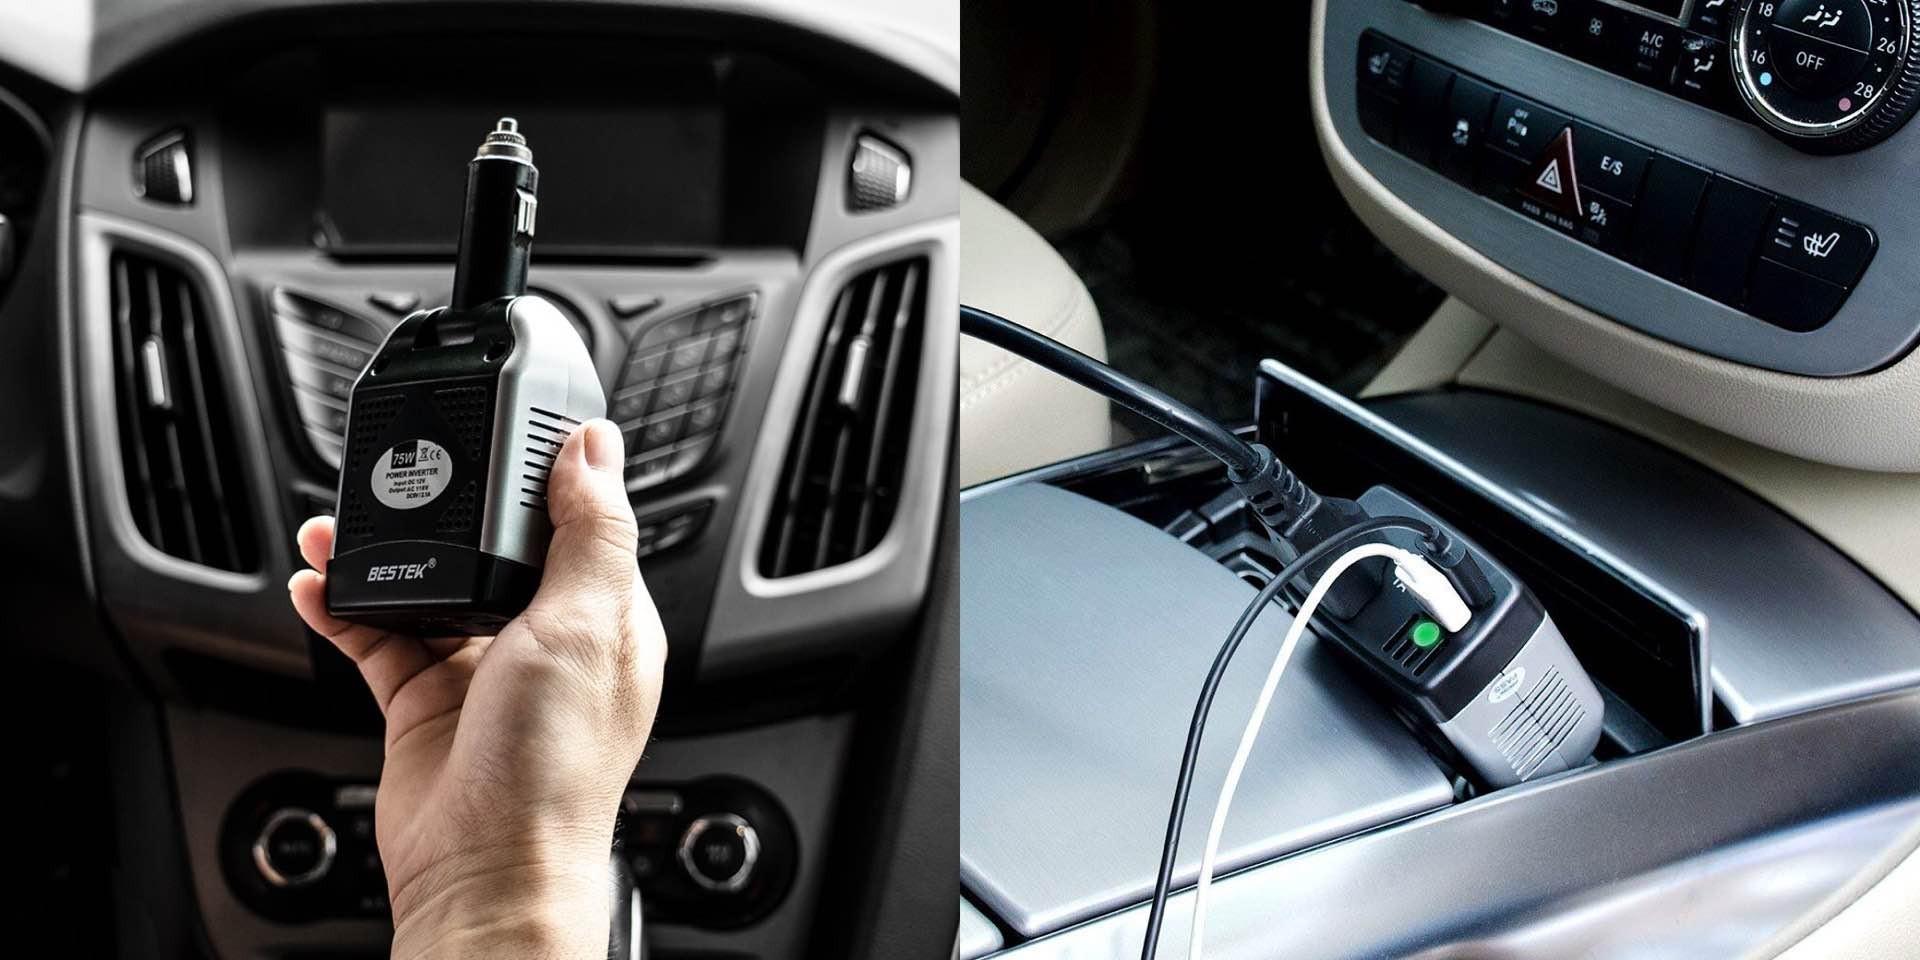 bestek-75w-in-car-power-inverter-2